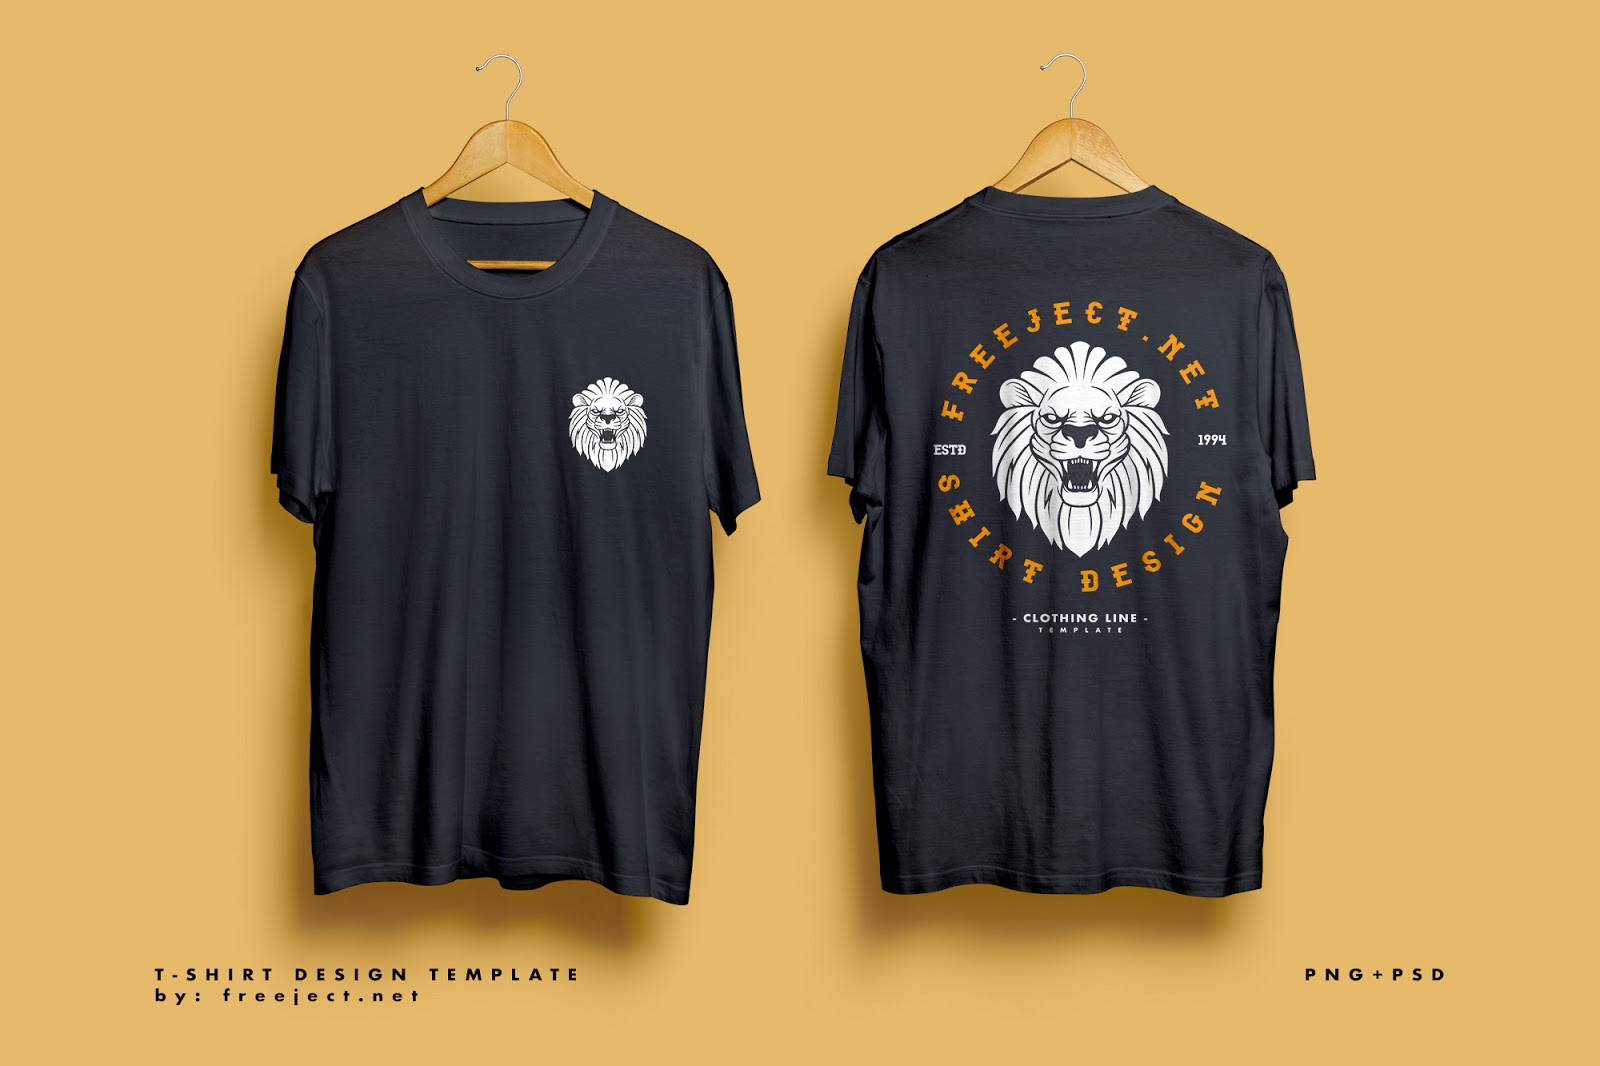 Lion Badge Retro Design Free Download T Shirt Design Template Psd File